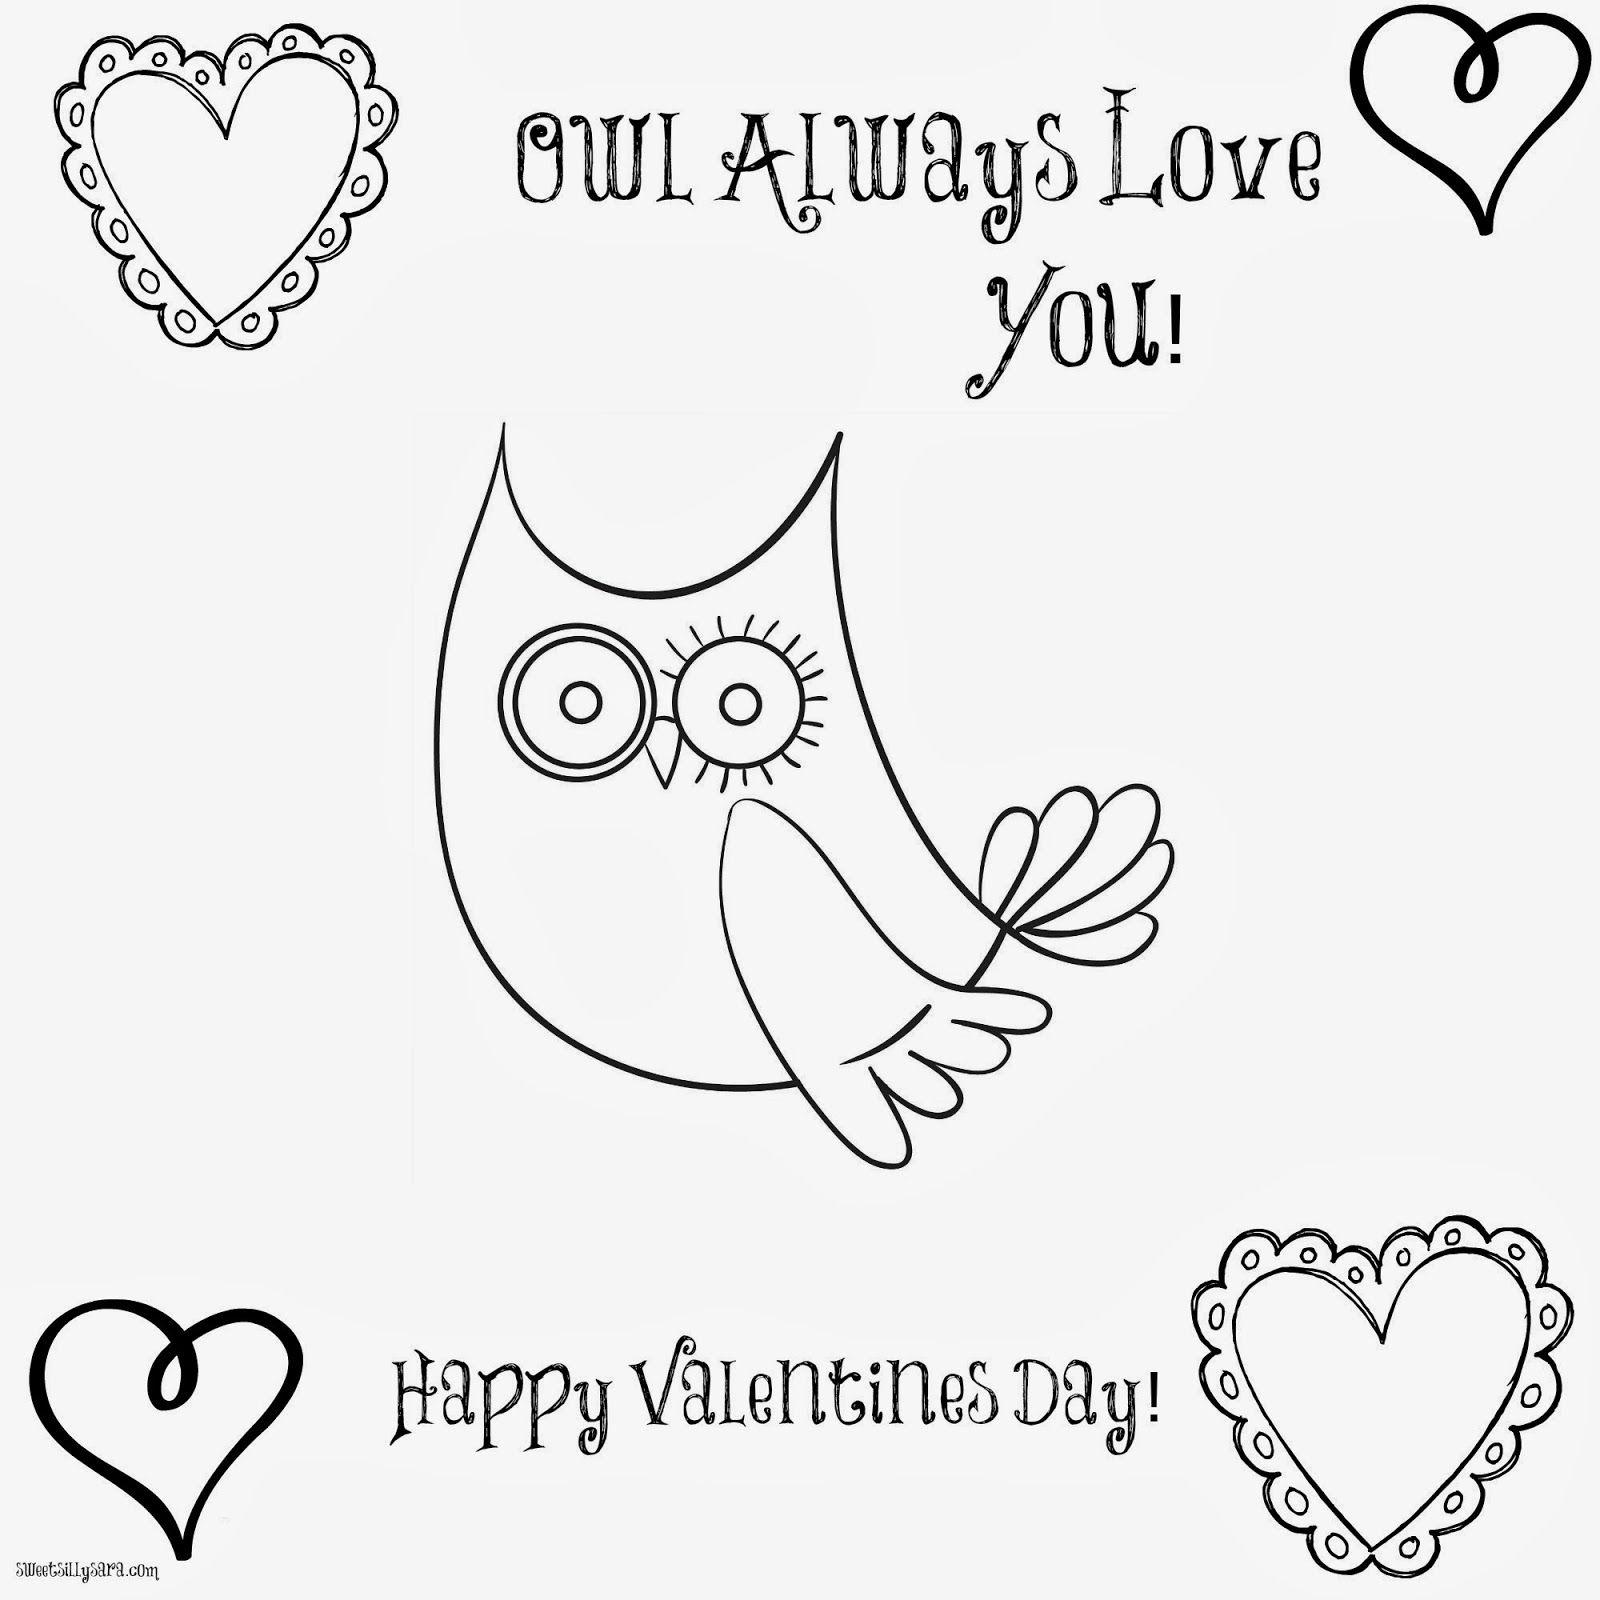 Owl Valentine Coloring Page Pinned by www.myowlbarn.com | Valentine ...